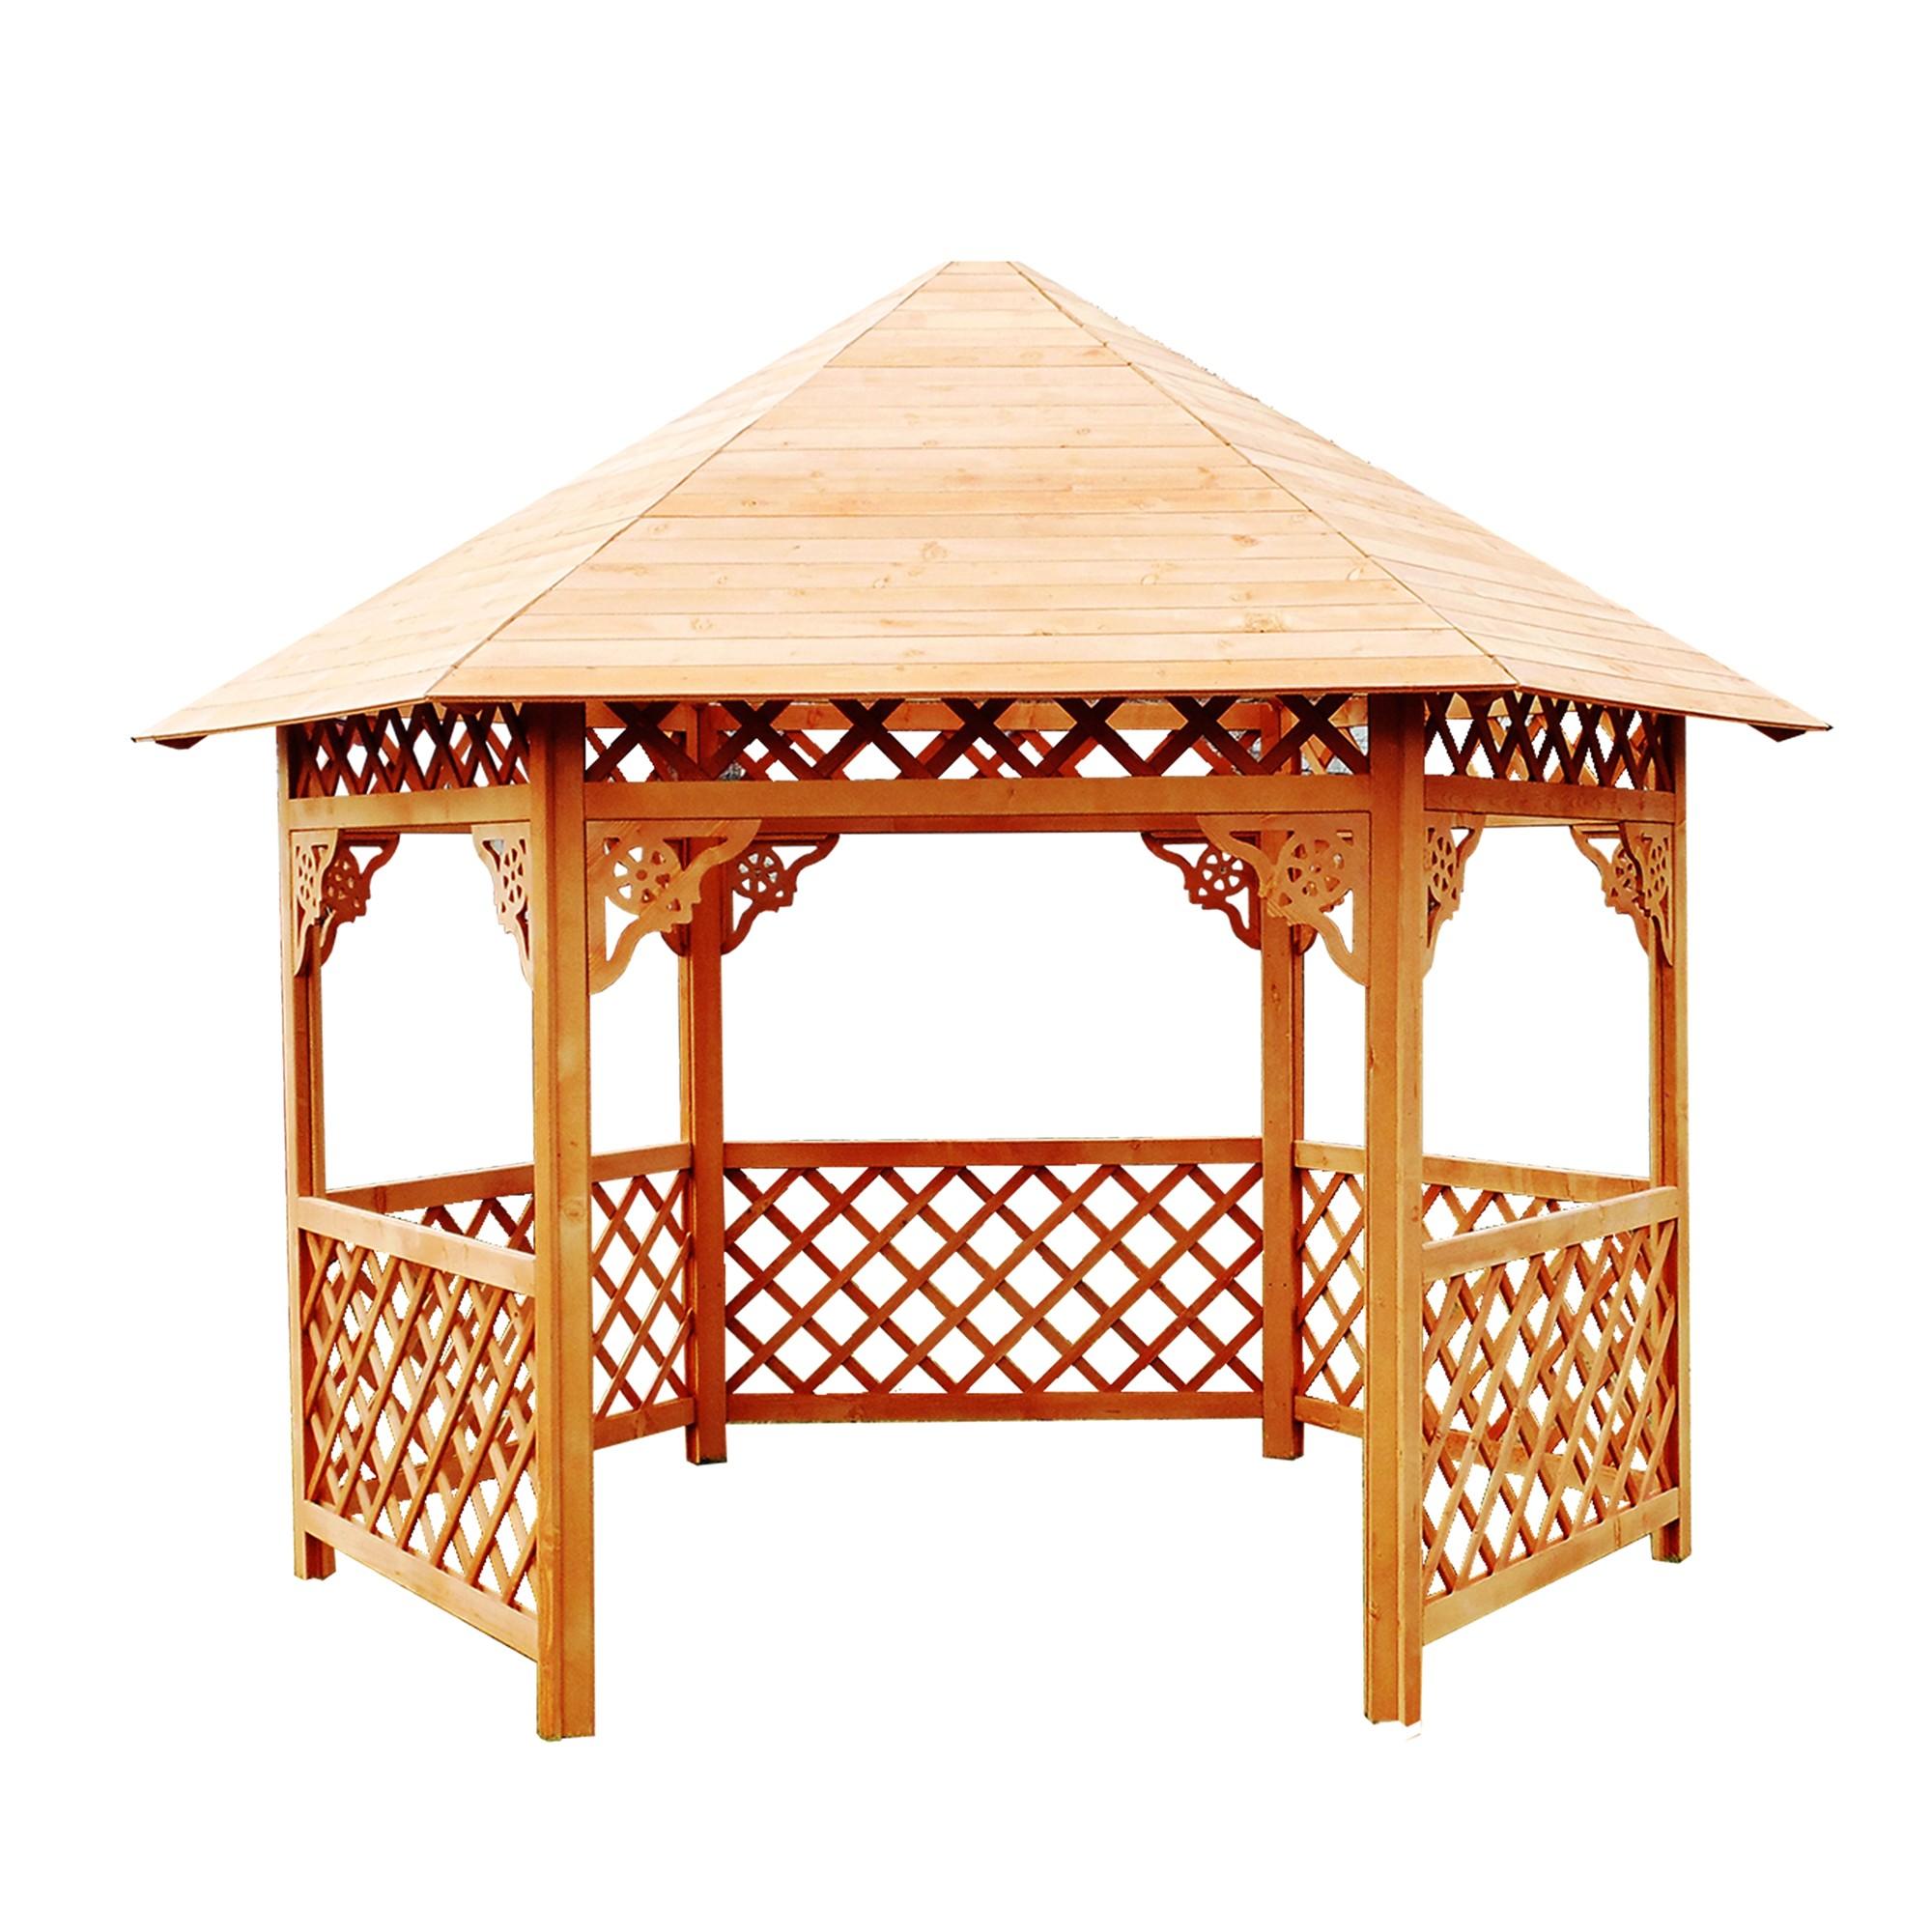 Dedeman Pavilion Gradina Hexagonal Din Lemn 3 5 X 4 X 3 2 M Dedicat Planurilor Tale